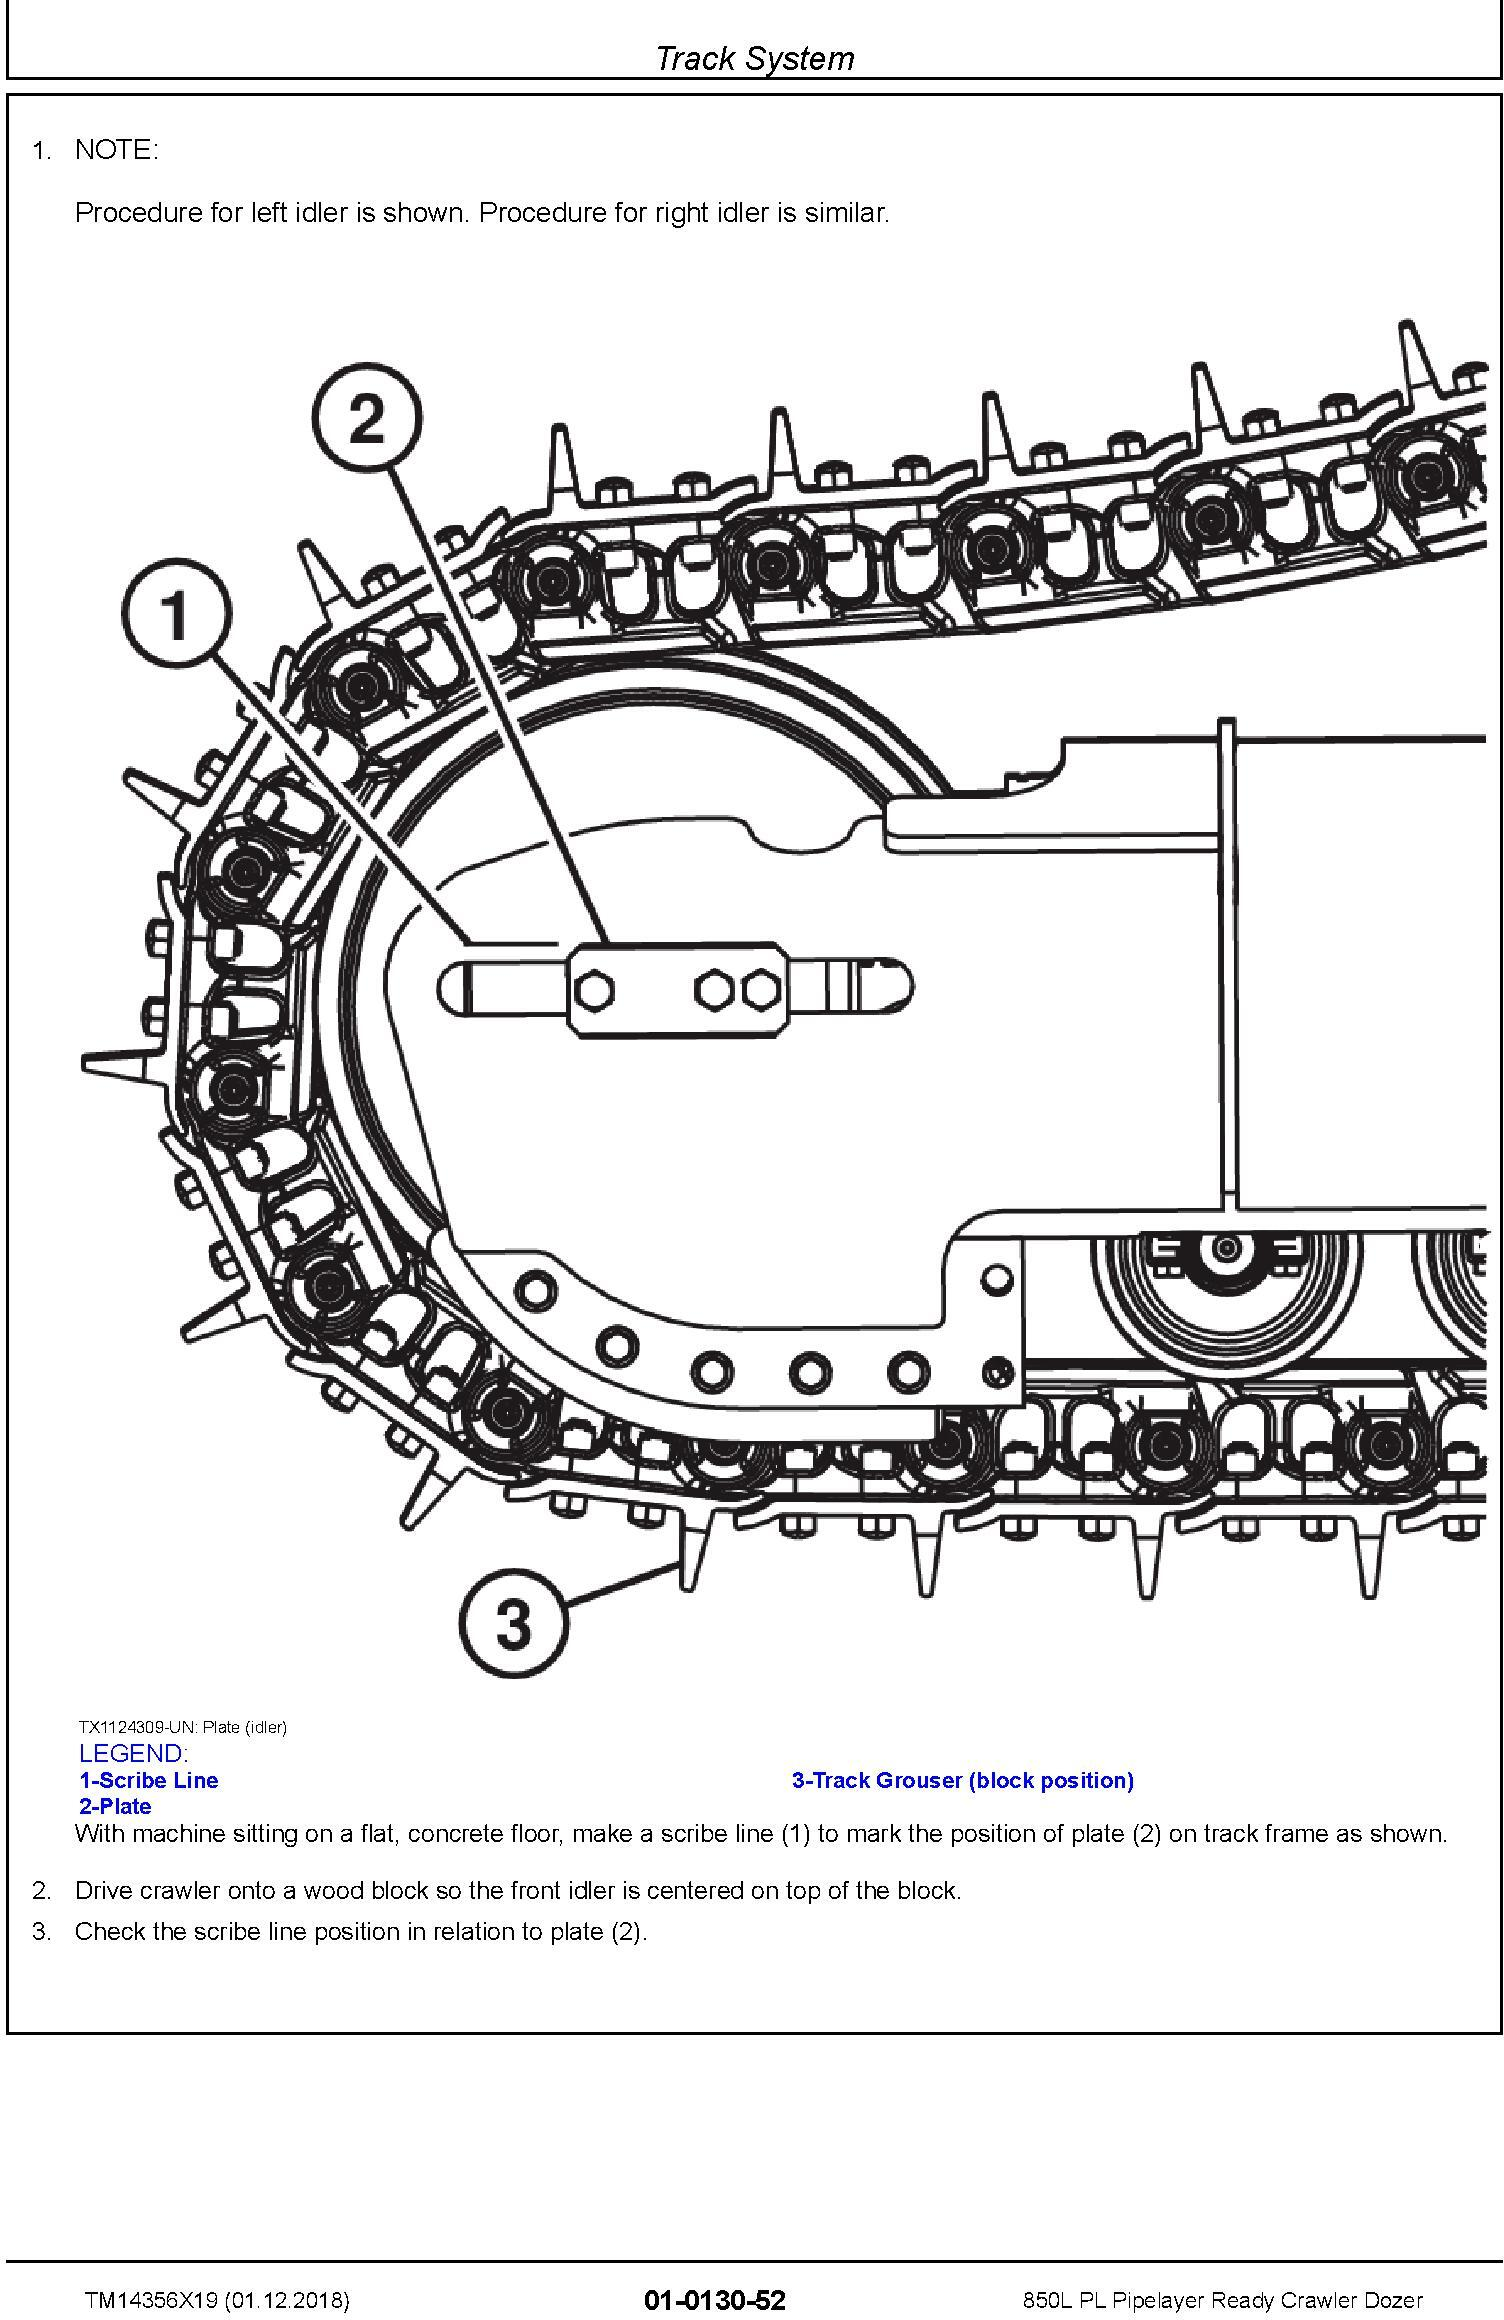 John Deere 850L PL Pipelayer Ready Crawler Dozer Repair Technical Manual (TM14356X19) - 3